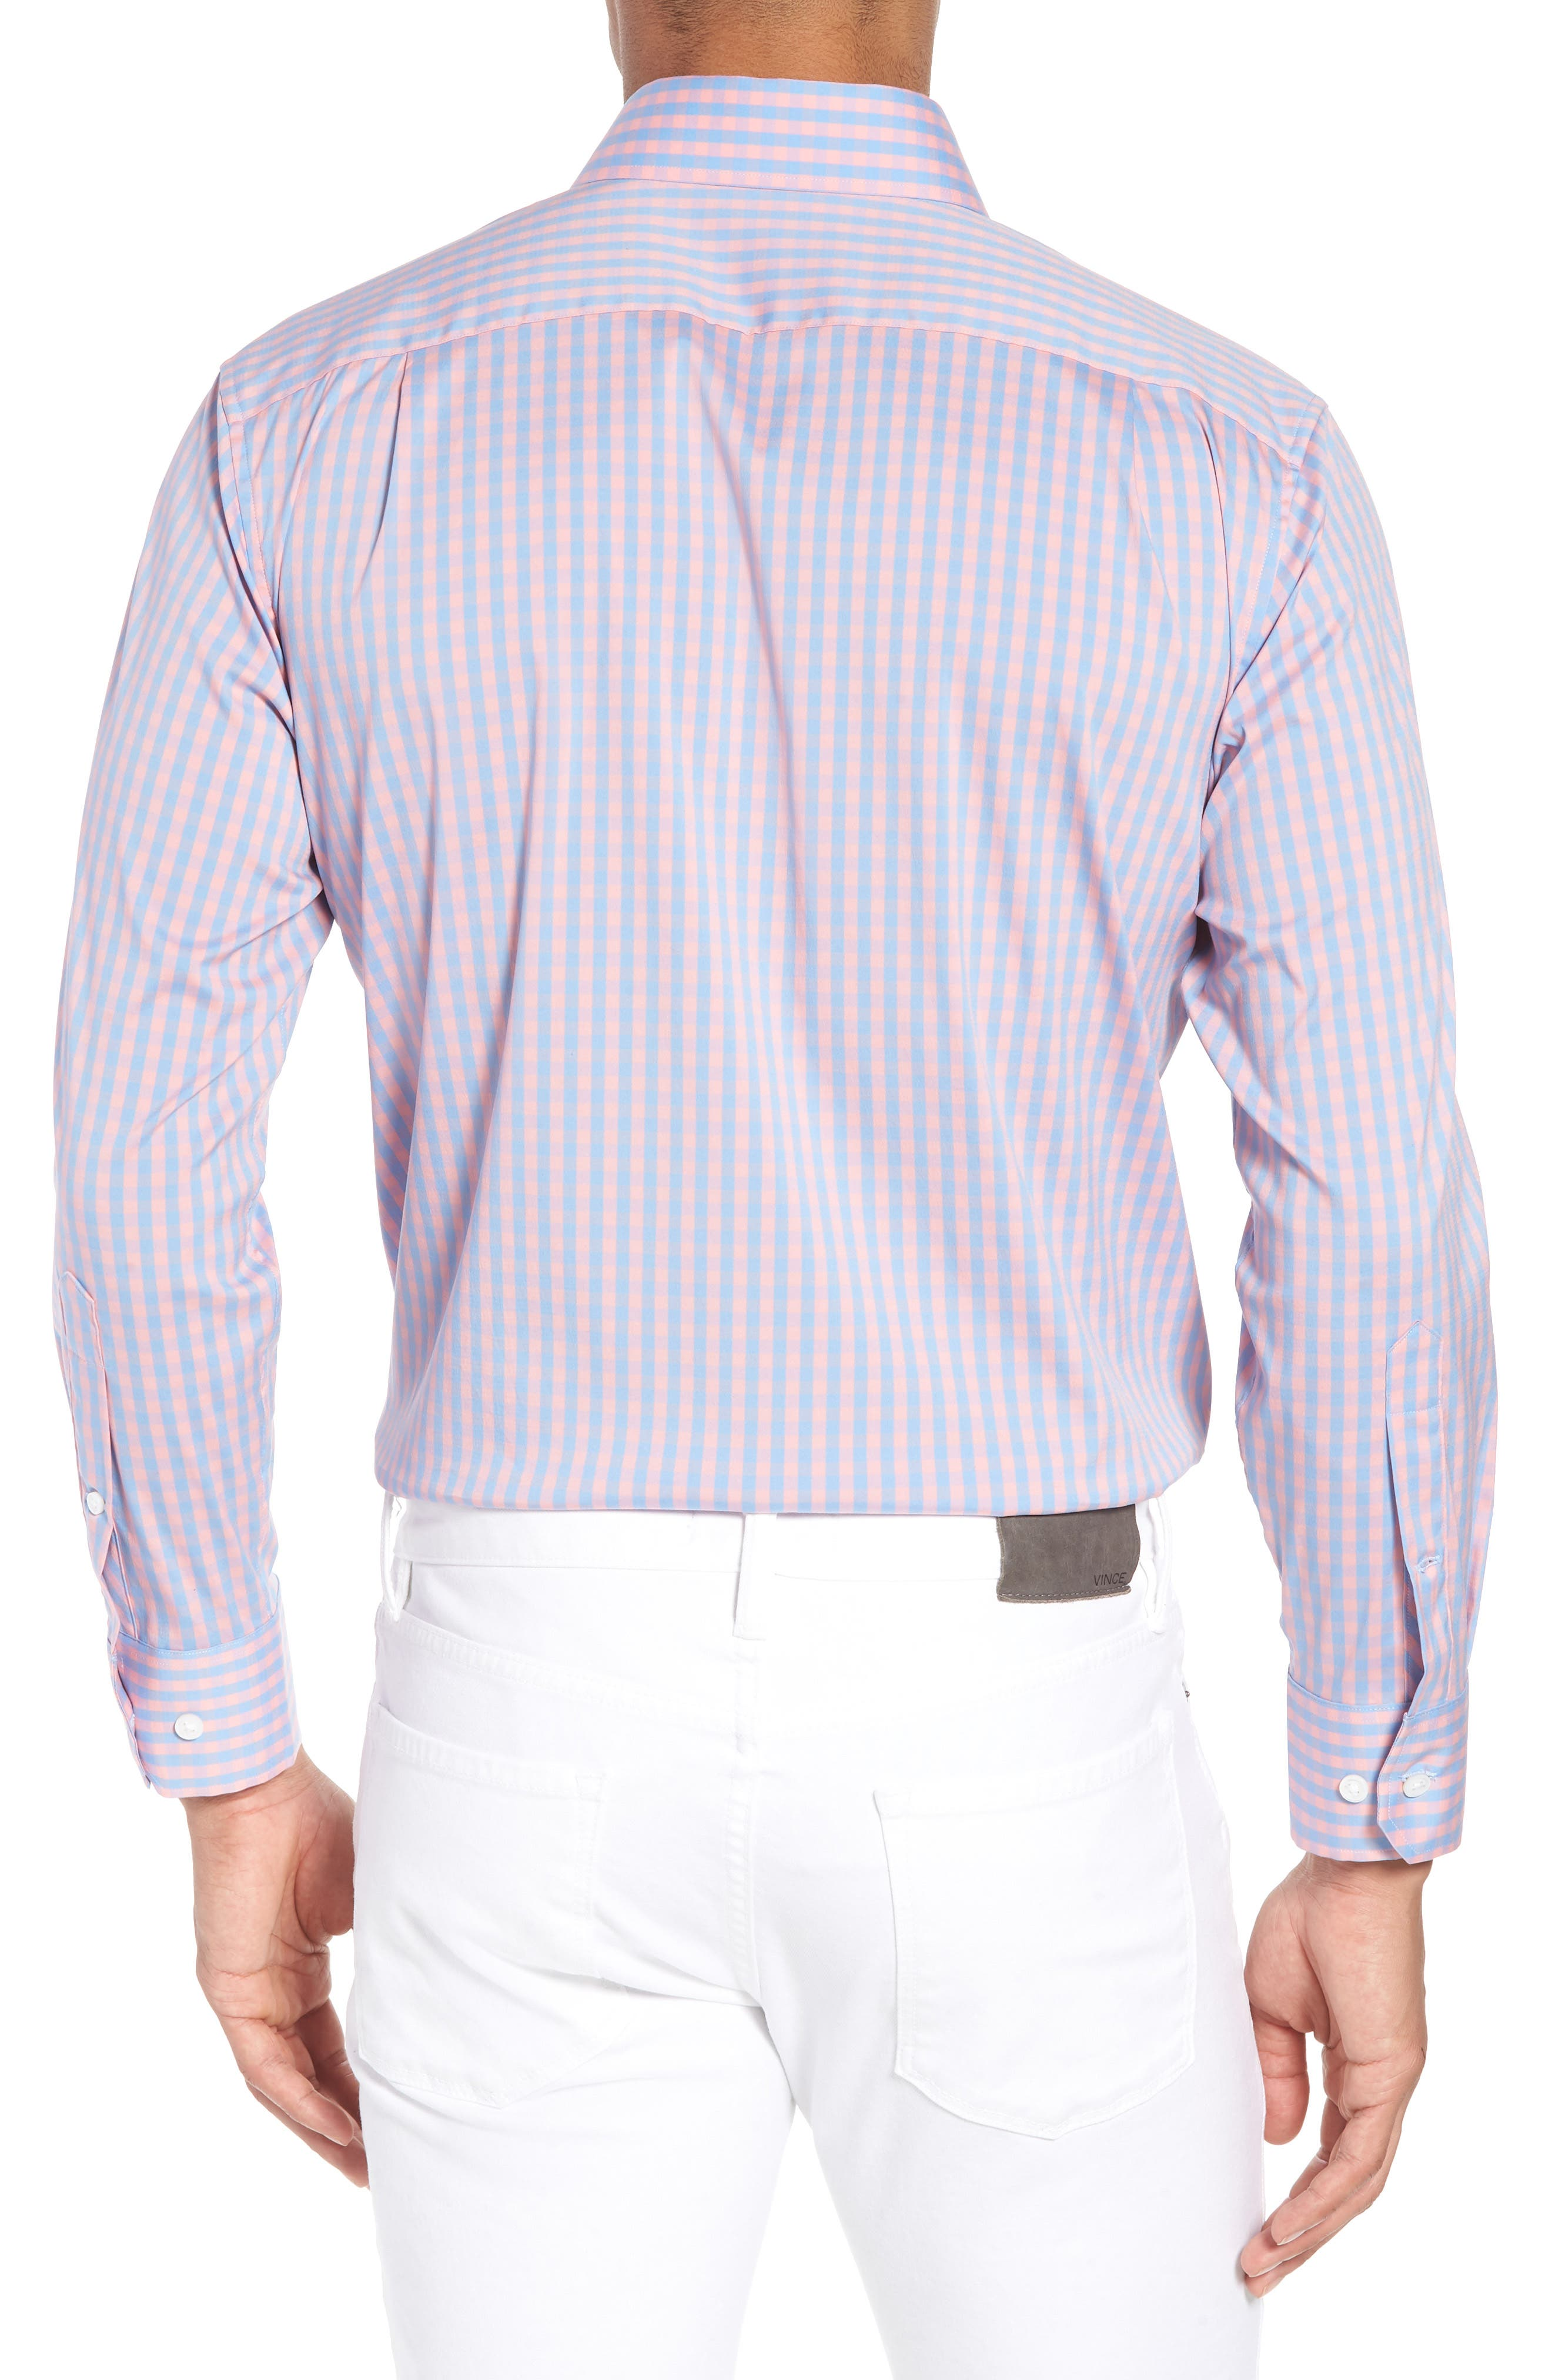 Jetsetter Slim Fit Stretch Check Dress Shirt,                             Alternate thumbnail 3, color,